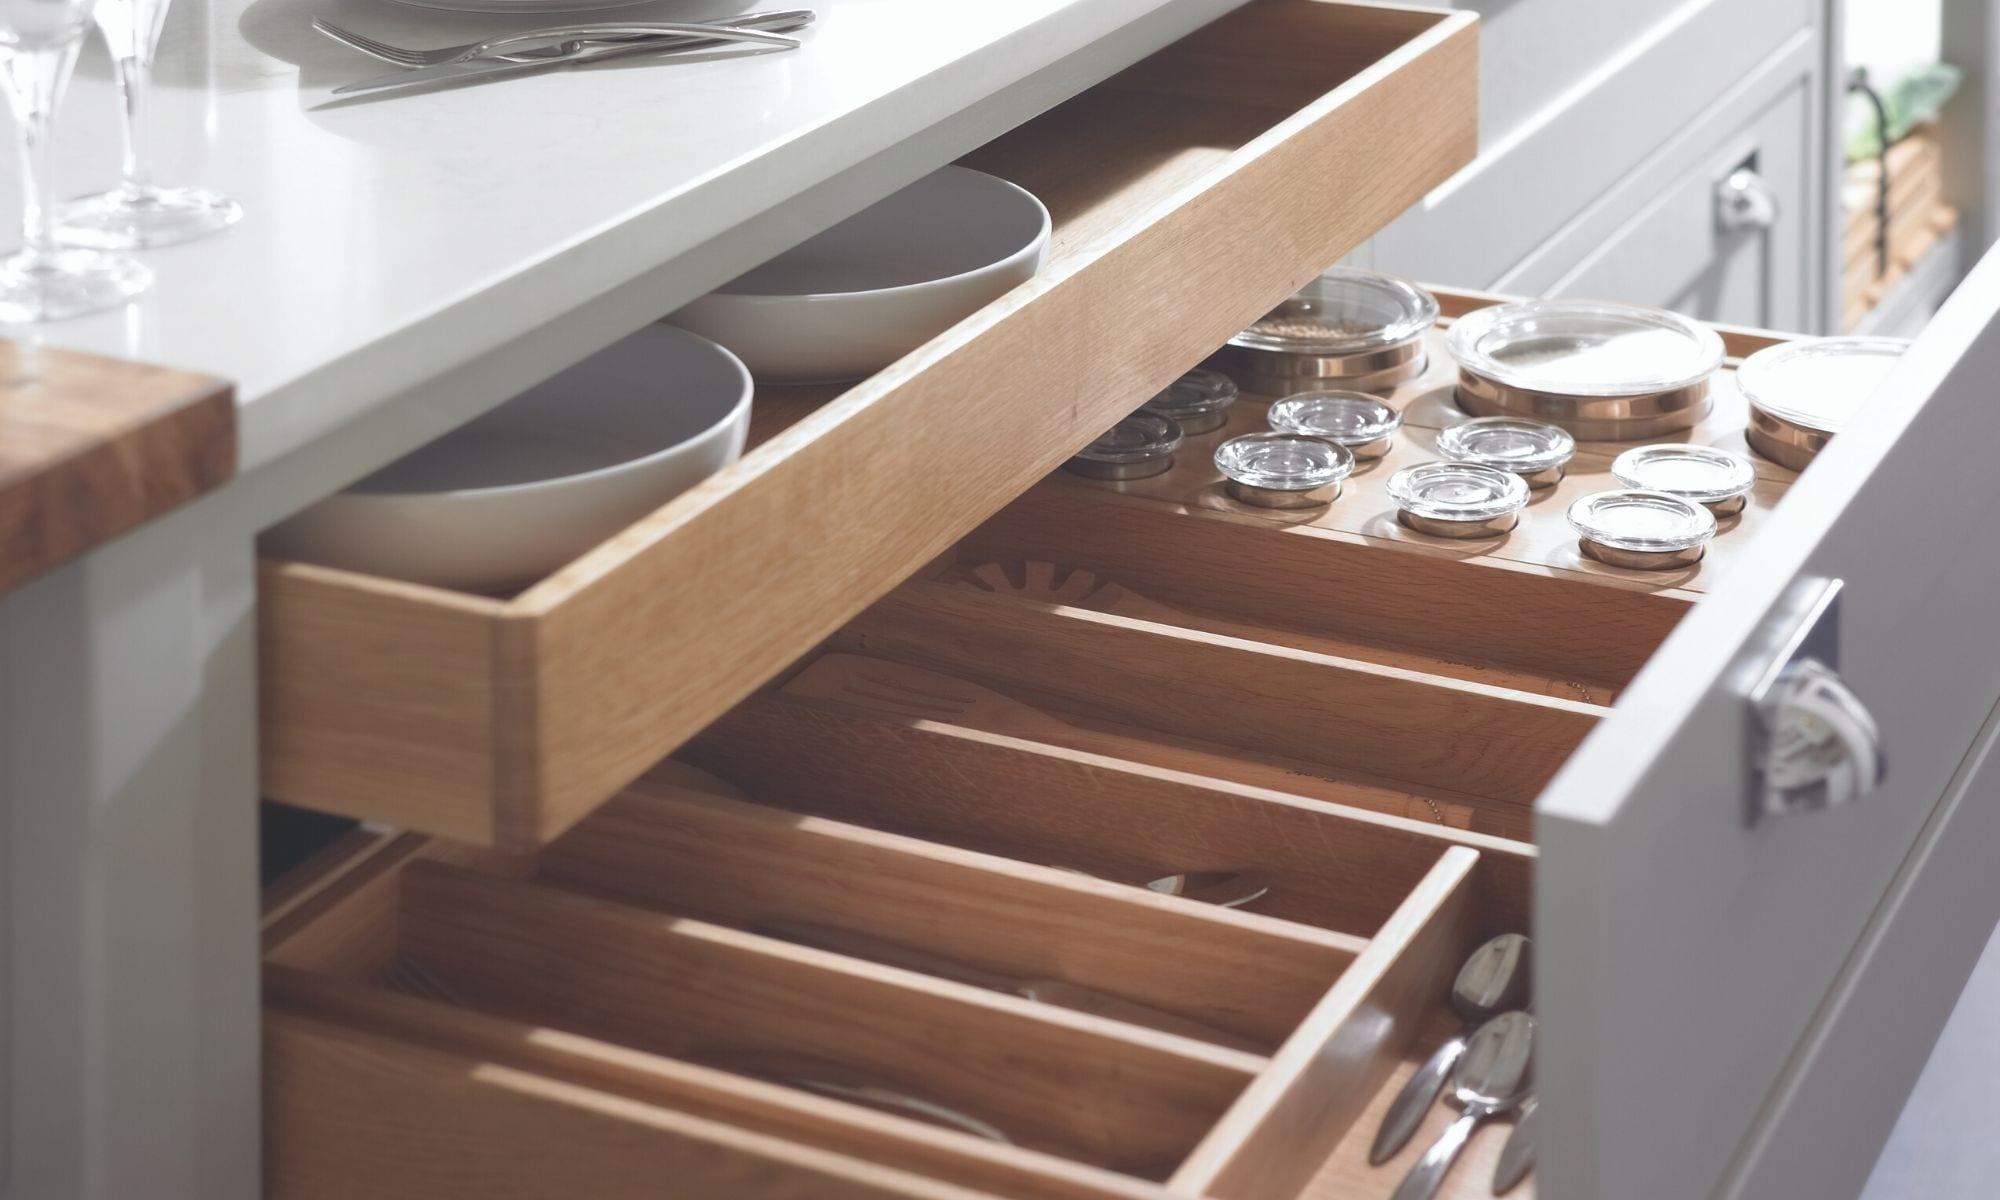 In-frame drawer